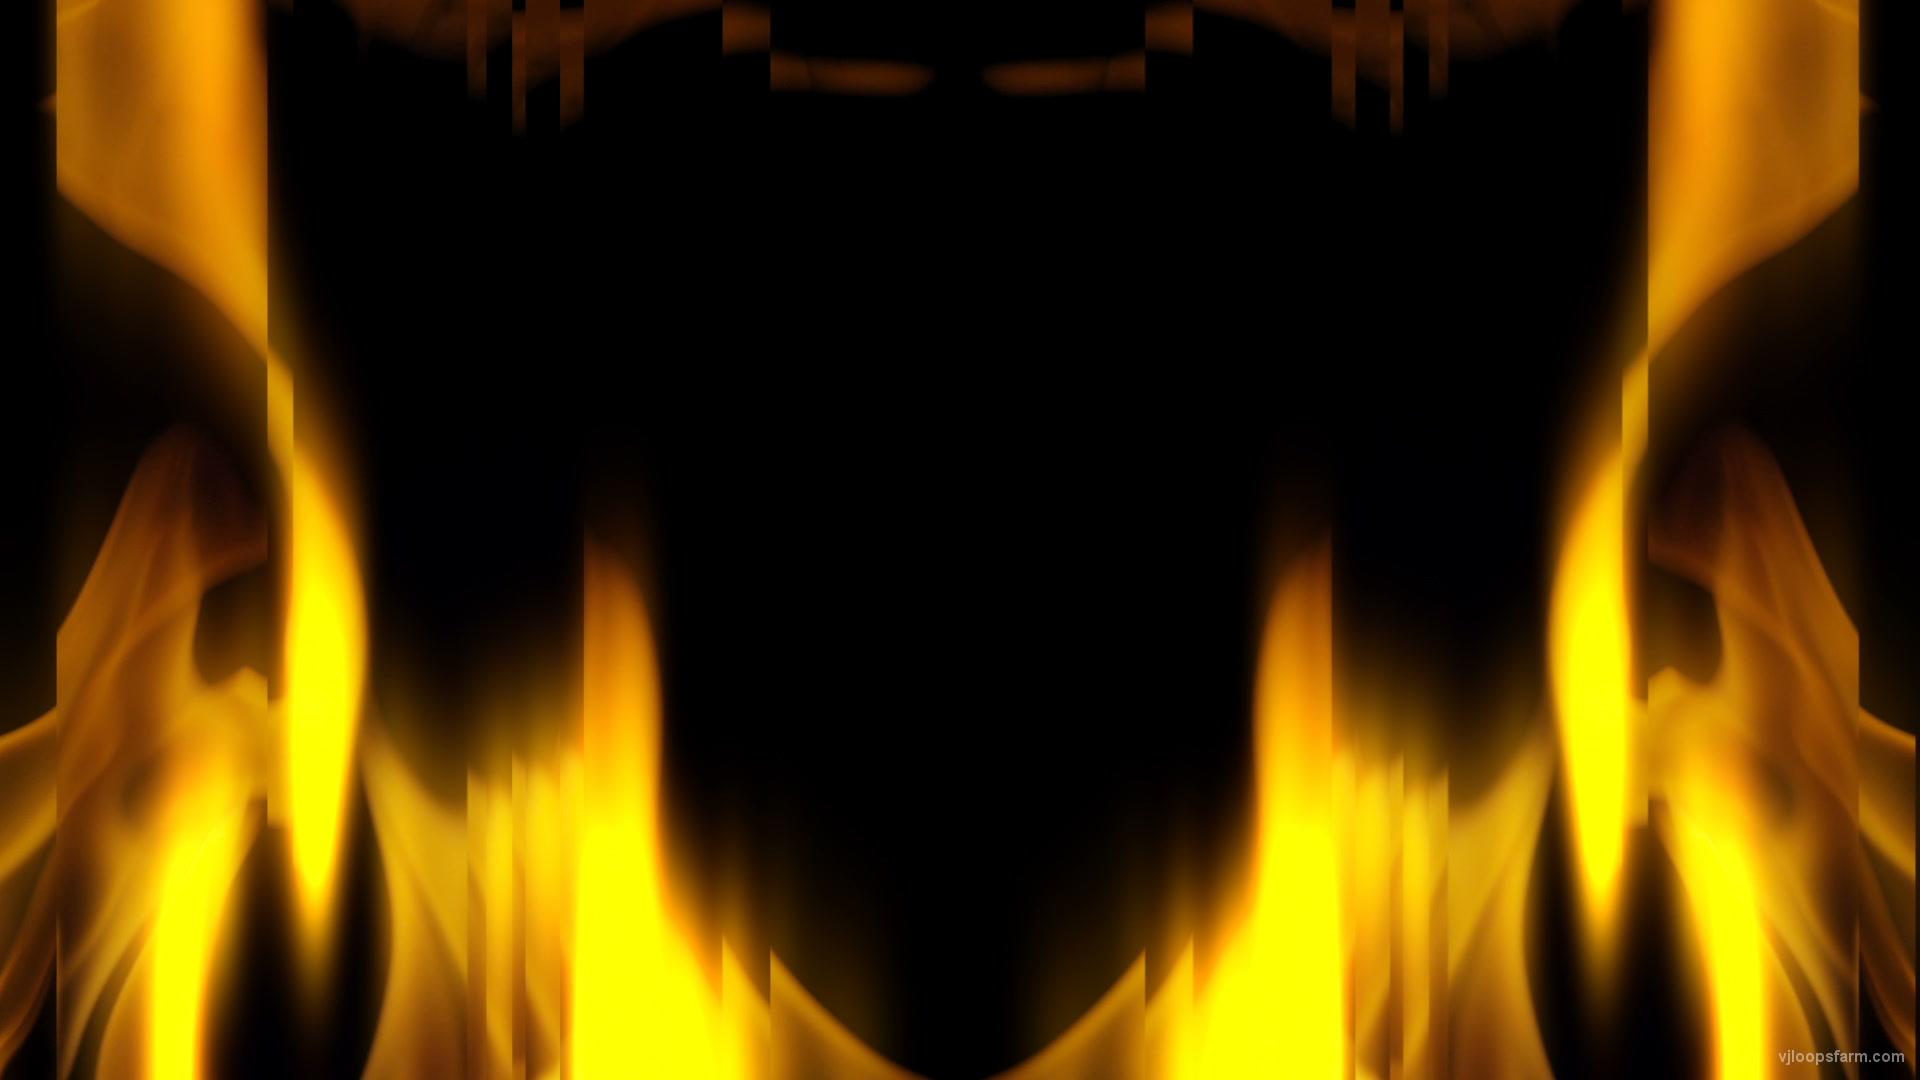 vj video background Abstract-Flame-Lighter-Glow-Y-220819Z-VA-VJ-Loop_003